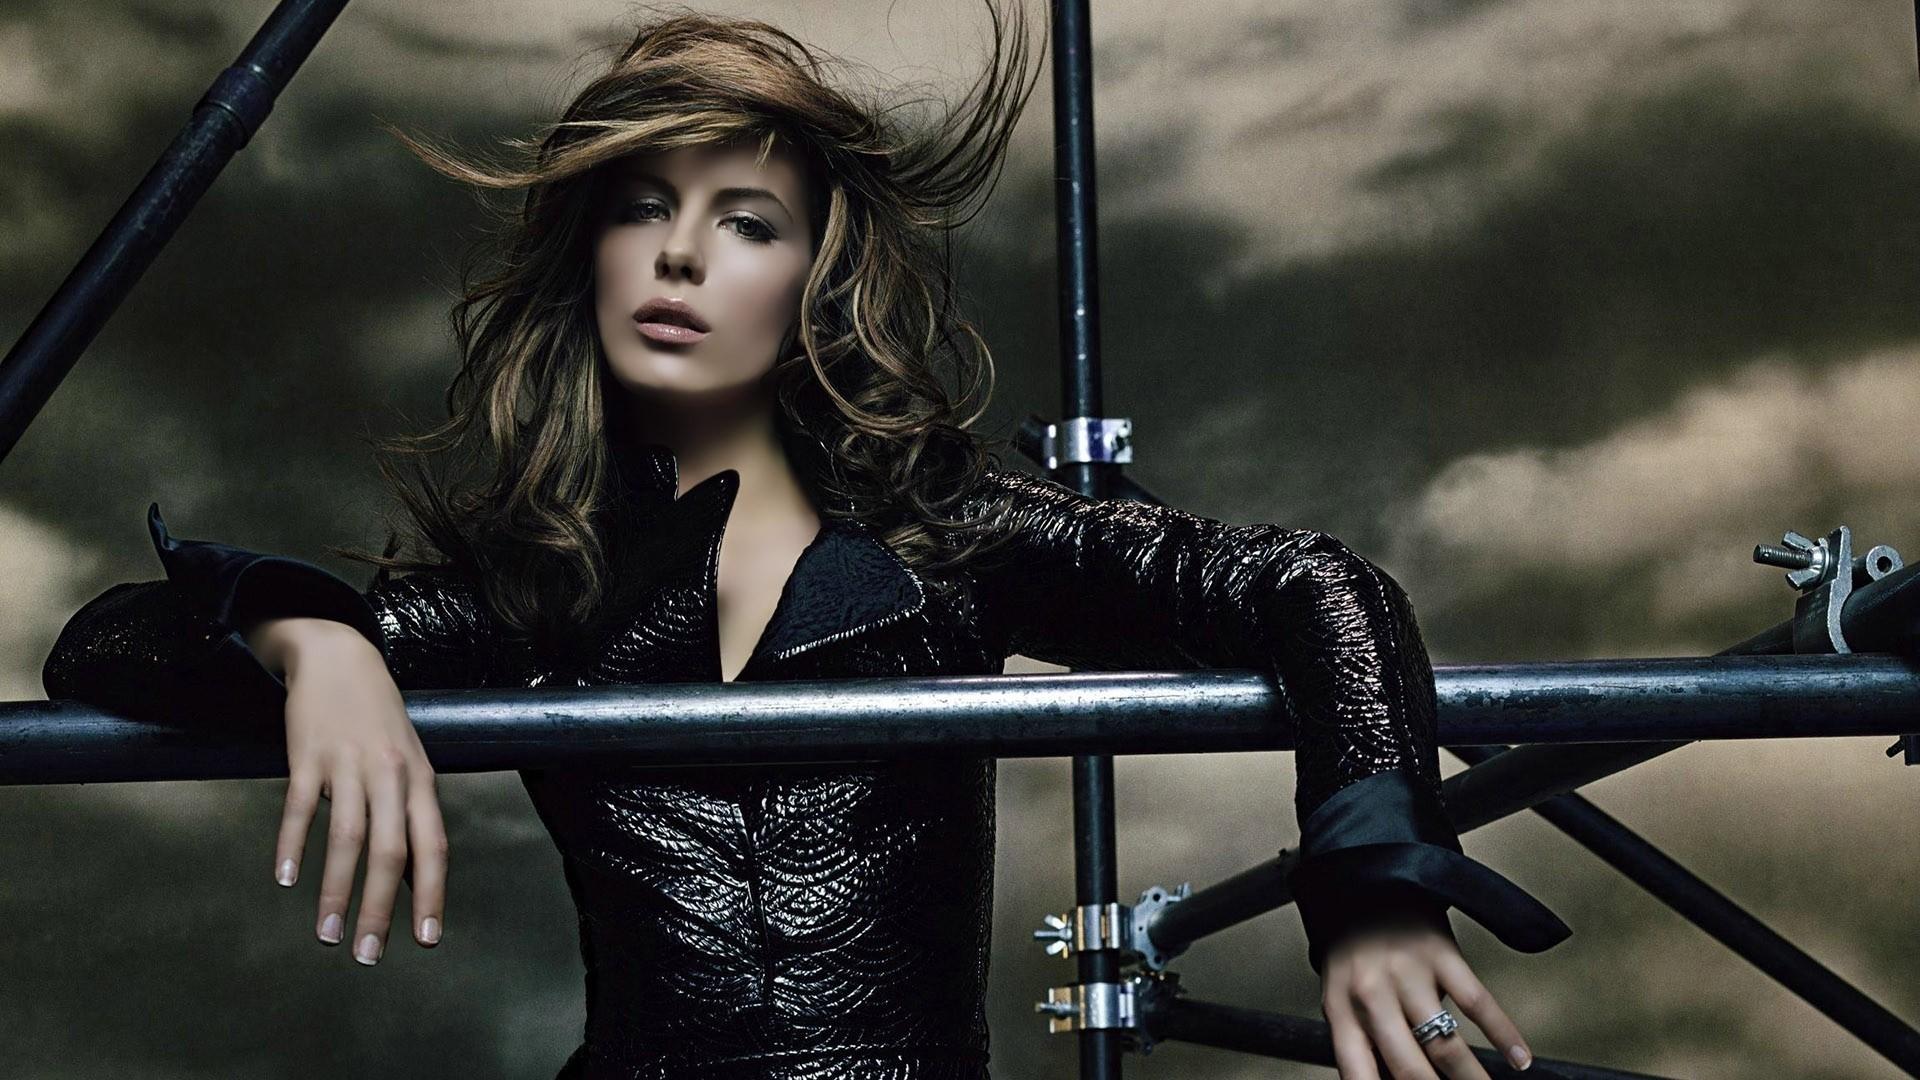 Kate Beckinsale Wallpaper Download